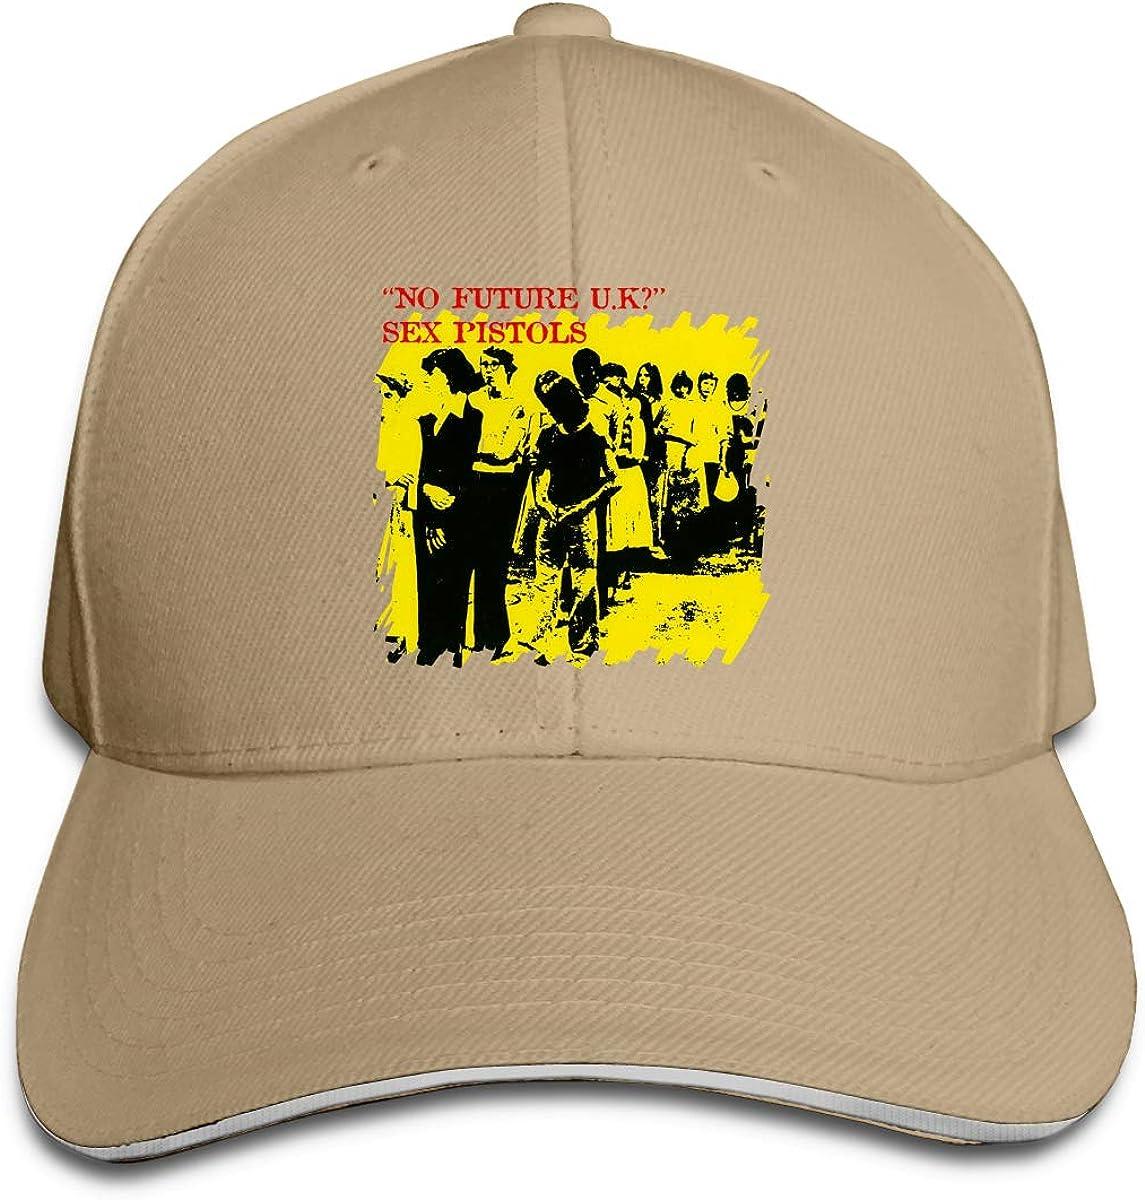 RoKrau Sex Pistols No Future UK Men Fashion Cowboy Hat One Size Natural